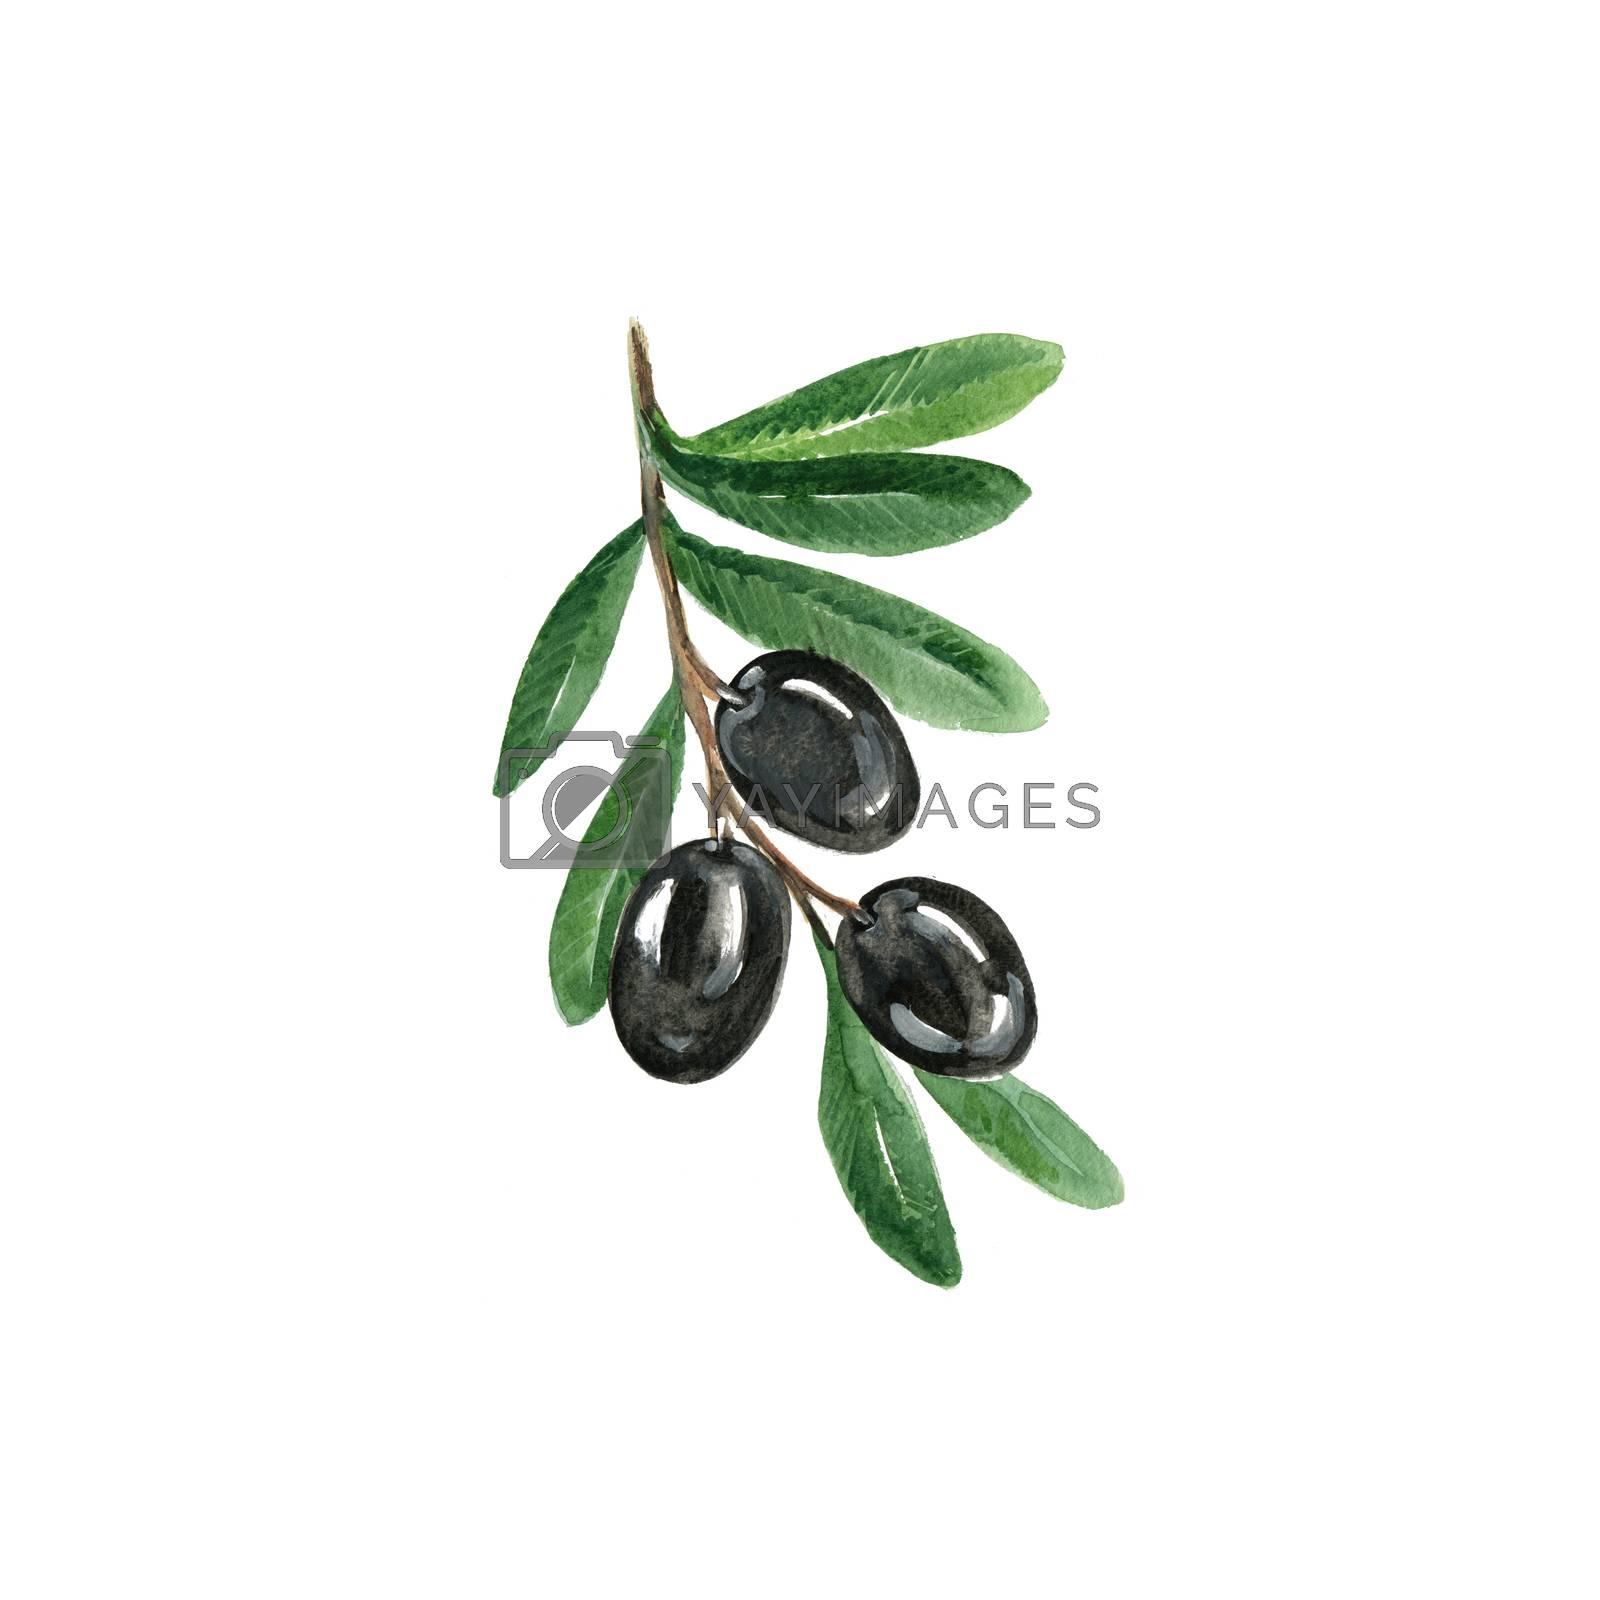 Watercolor Black Olives. Hand Drawn Illustration Organic Food Vegetarian Ingredient